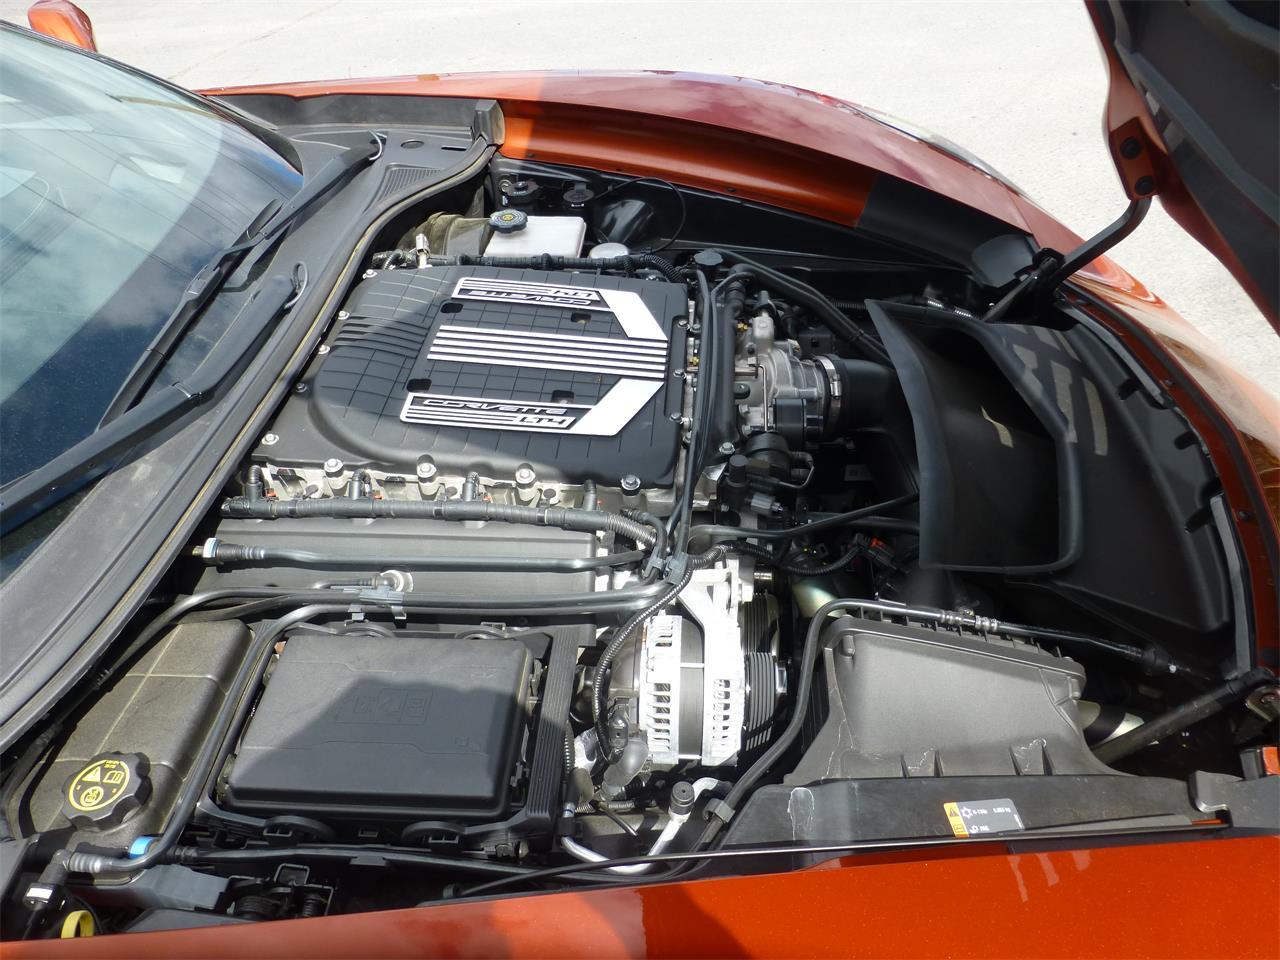 2015 Chevrolet Corvette Z06 (CC-1094042) for sale in Bend, Oregon